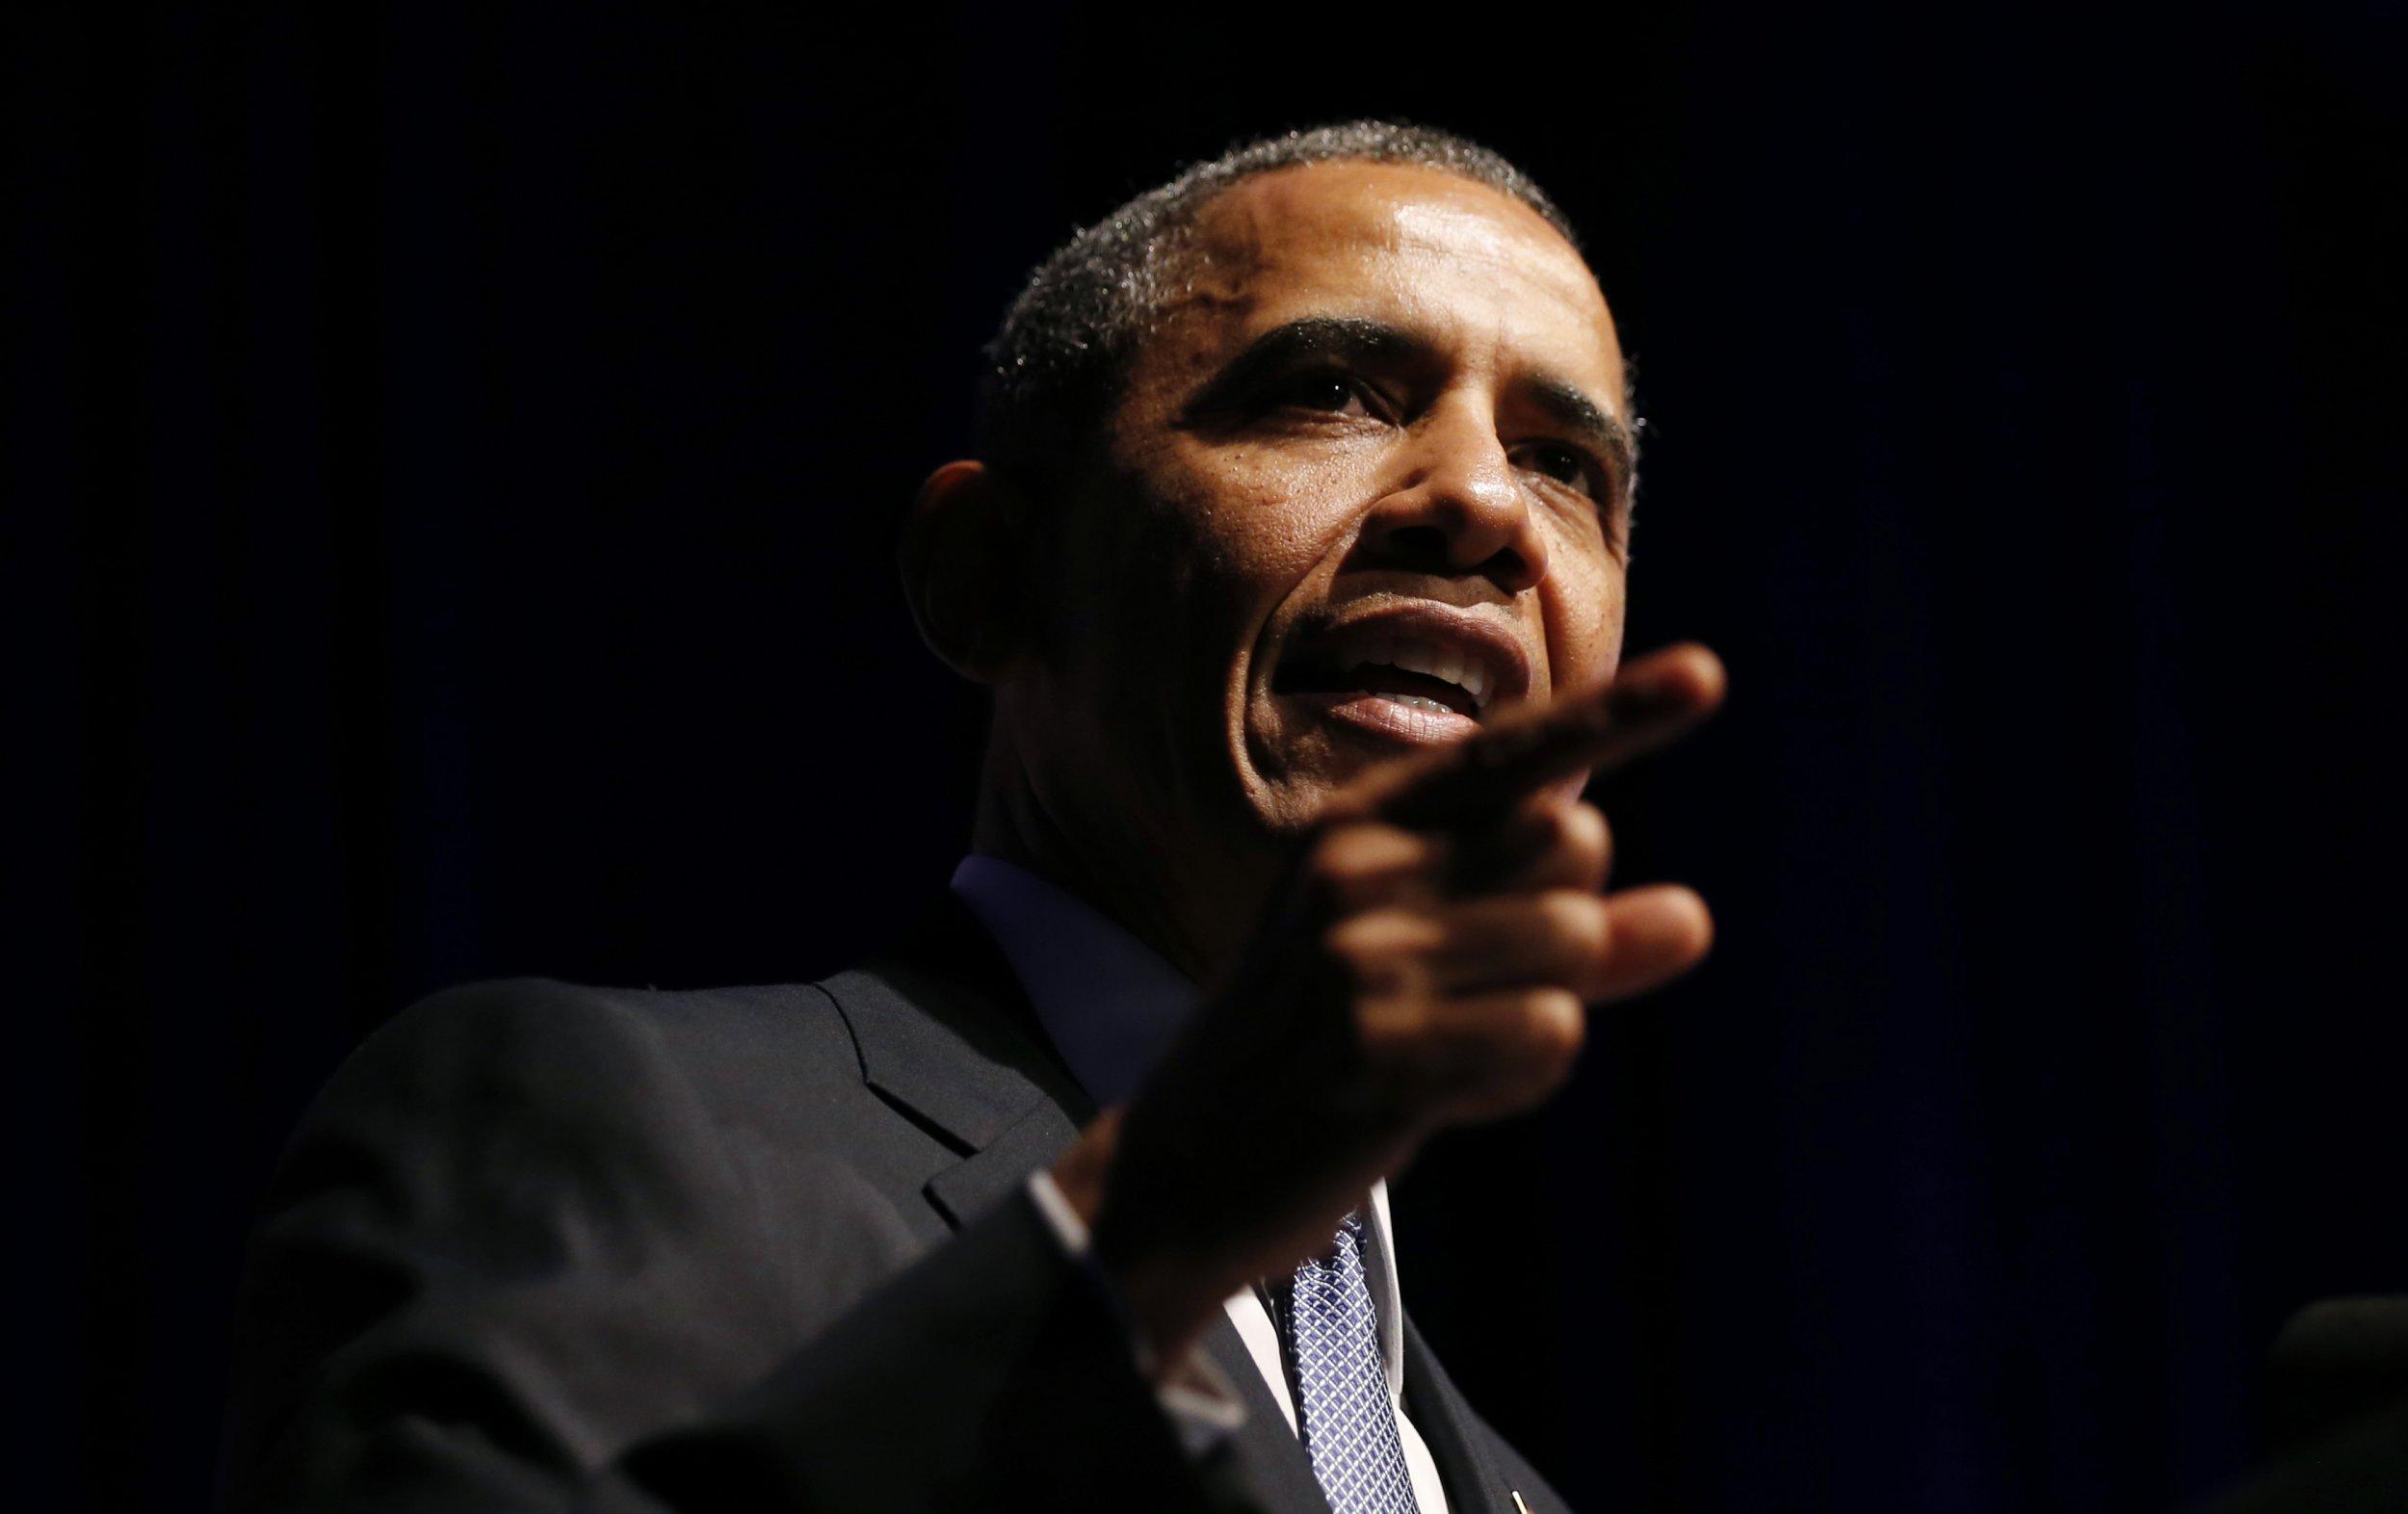 Barack Obama: Death of Michael Brown is 'Heartbreaking'